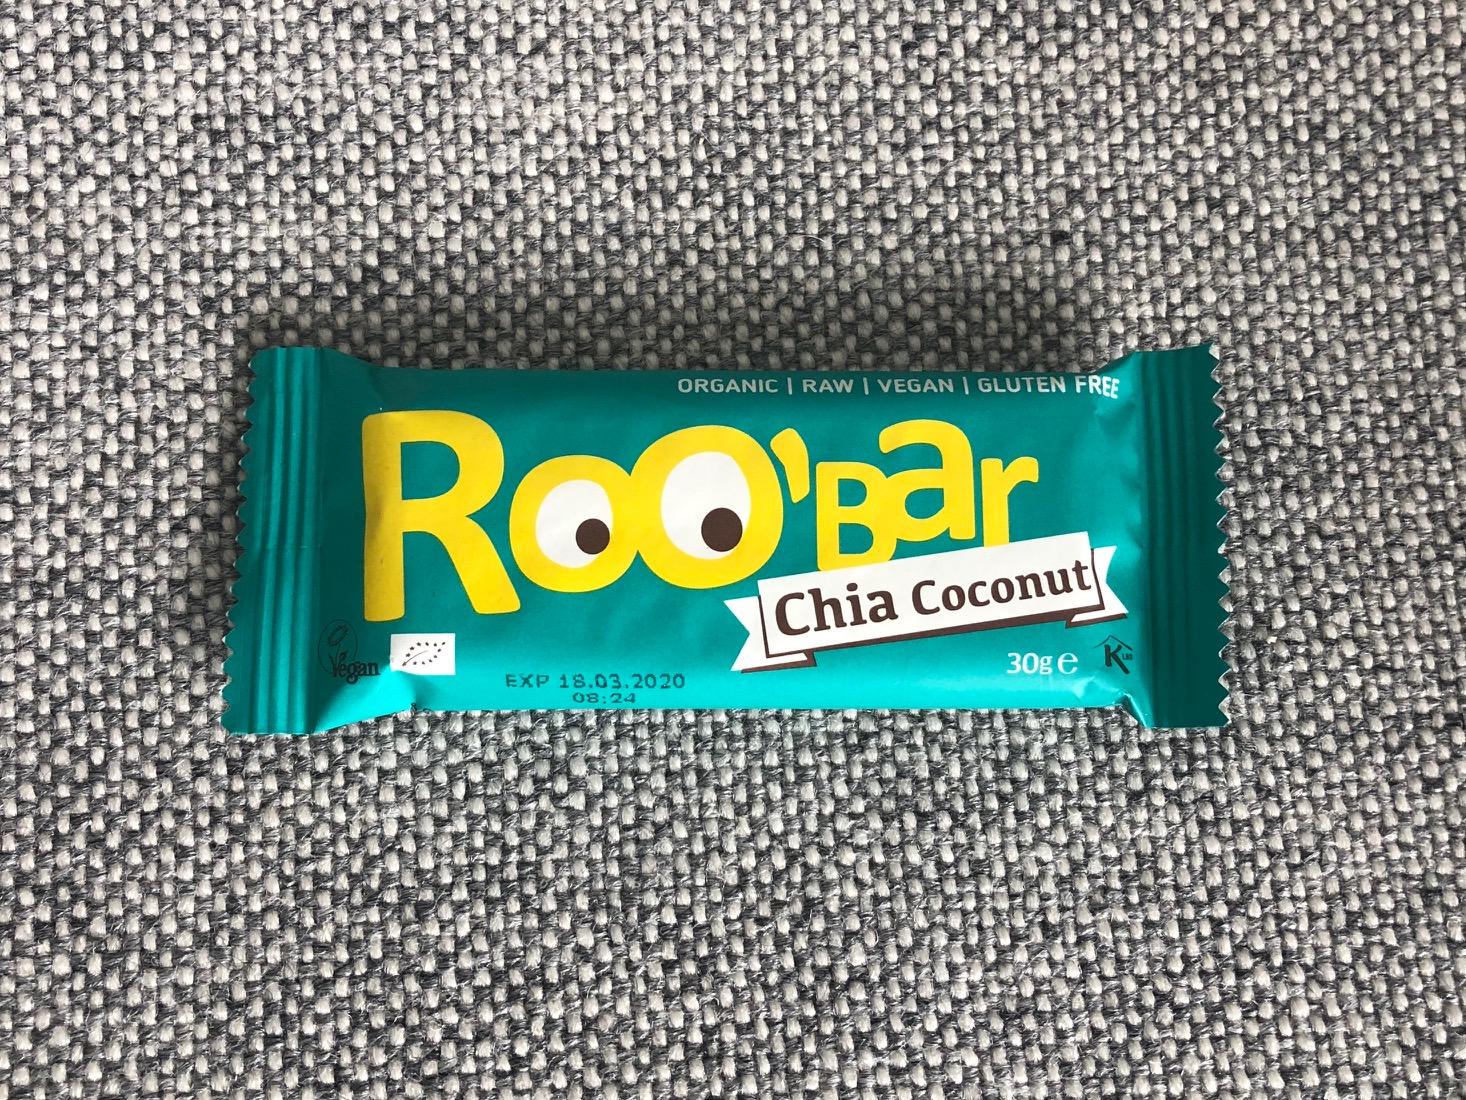 Roobar_Chia-Coconut